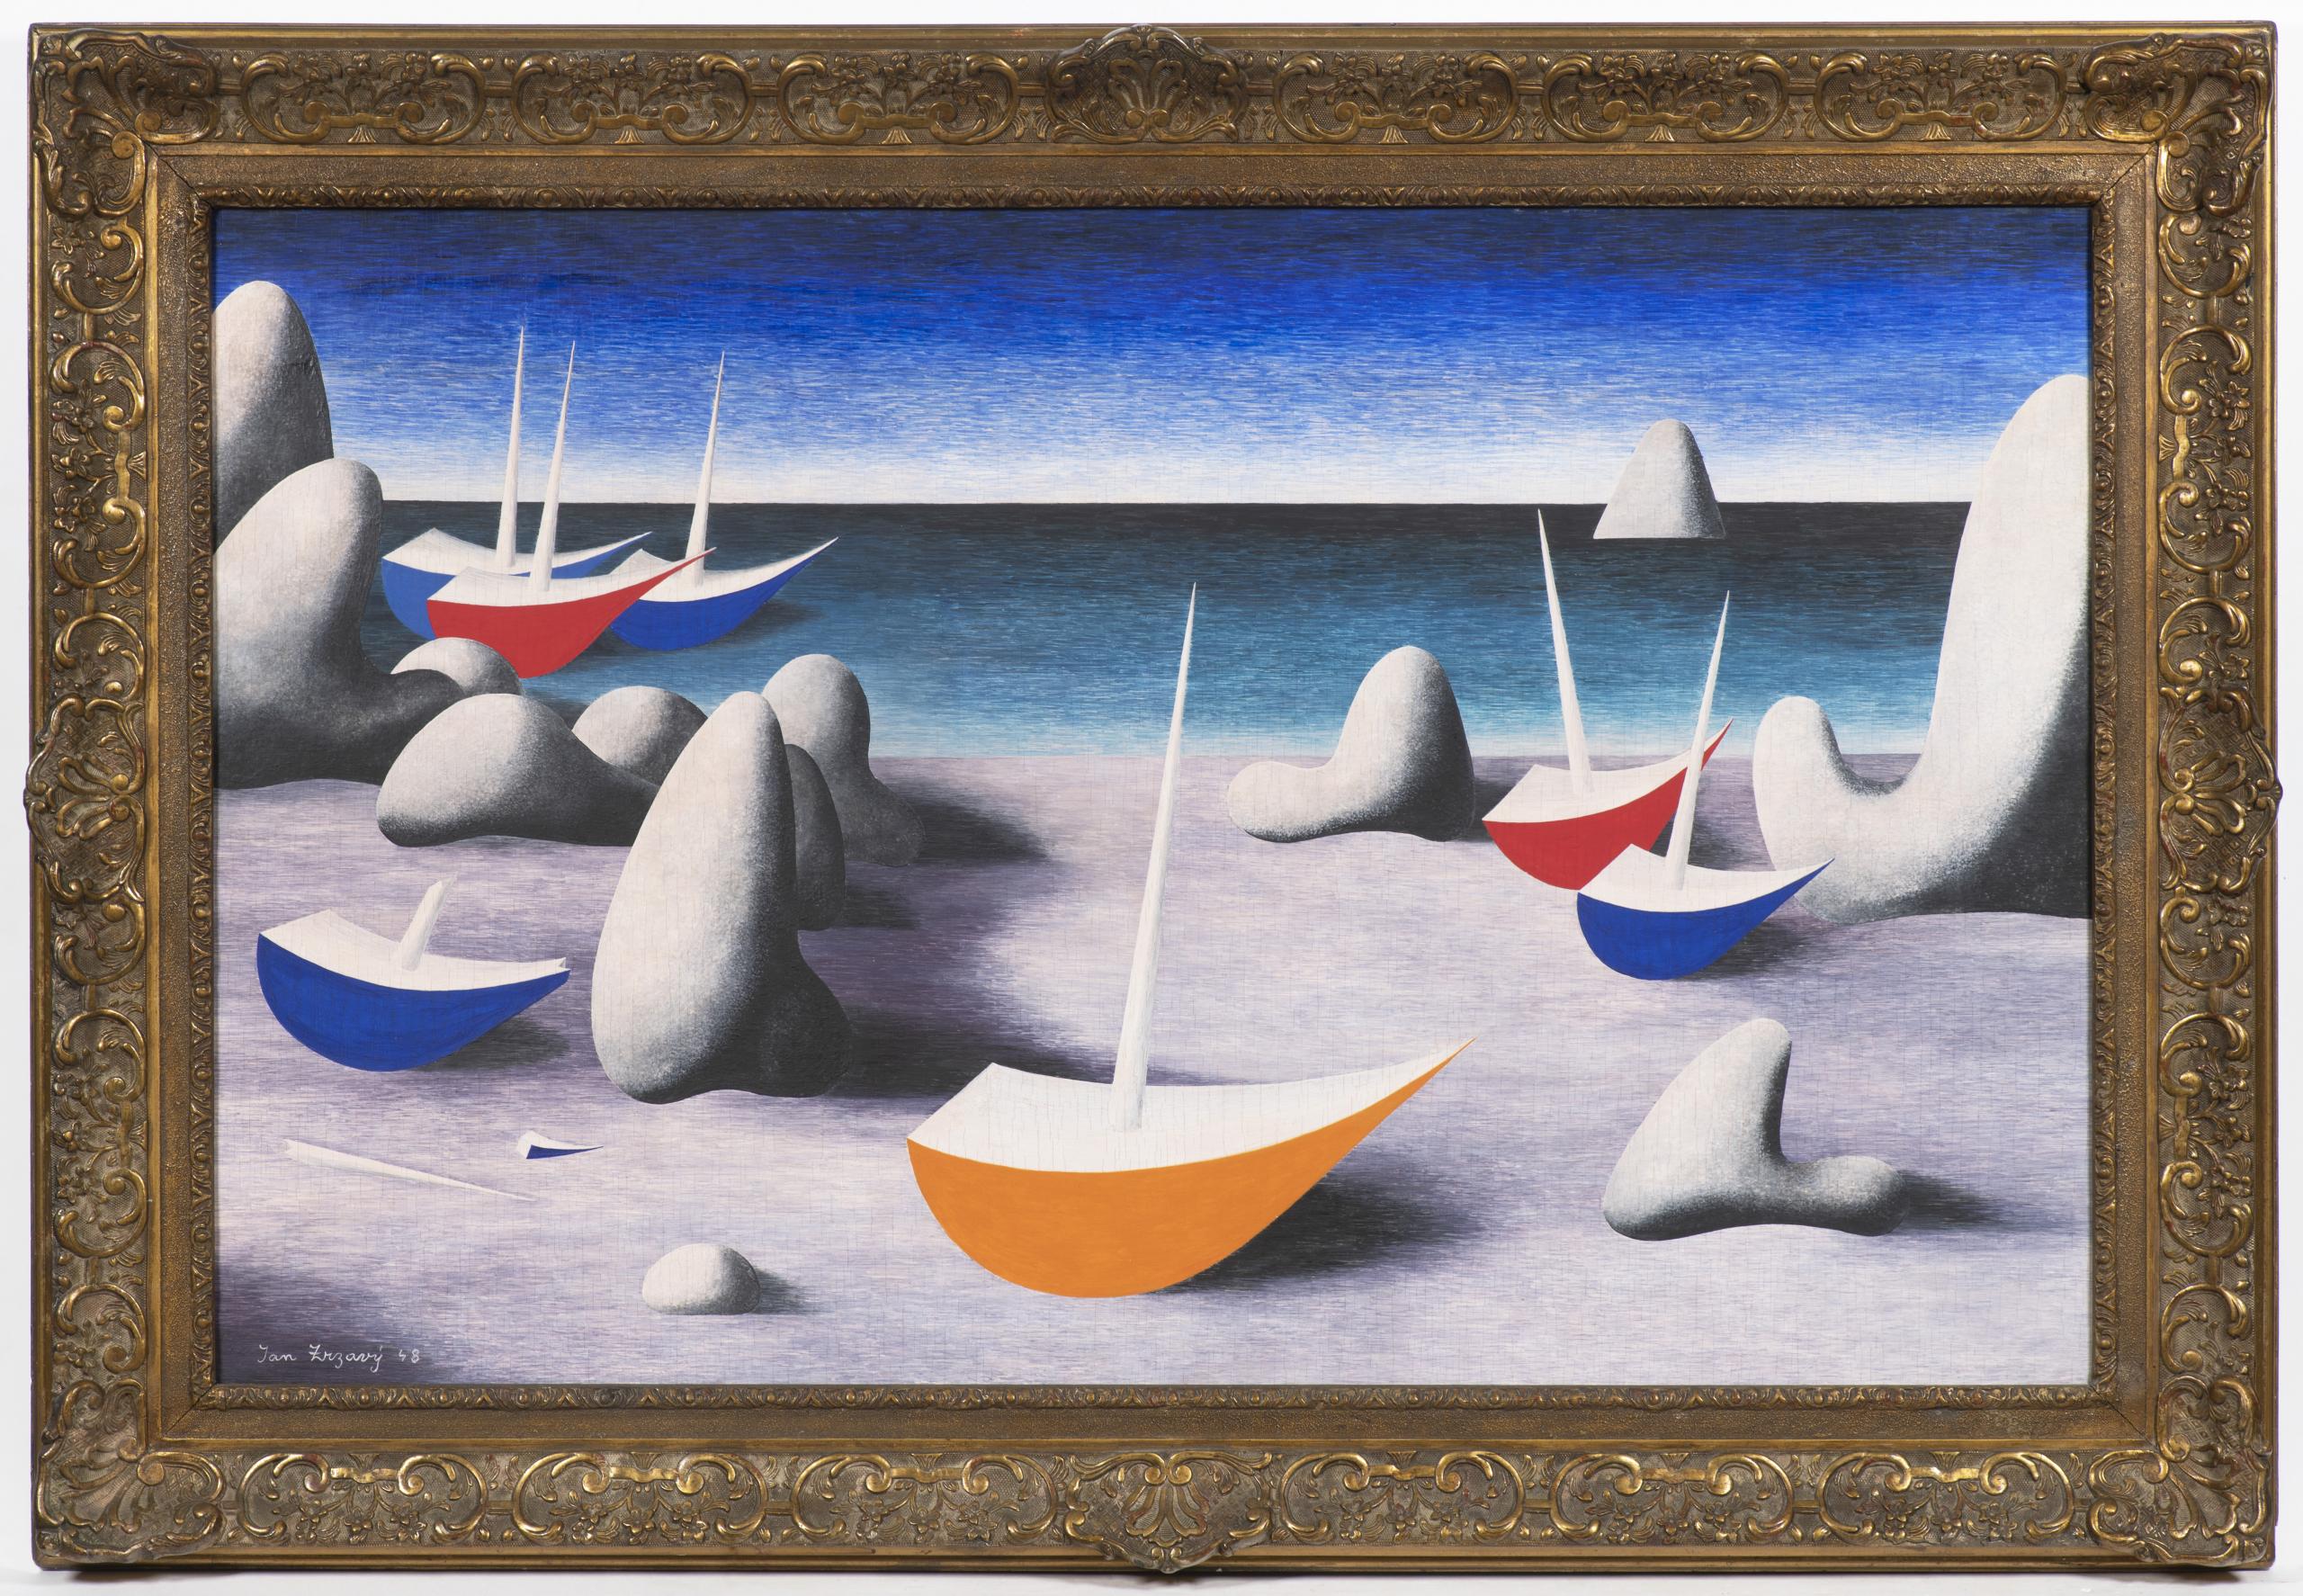 kralovna-mori-arthouse-hejtmanek-vecerni-aukce-2020